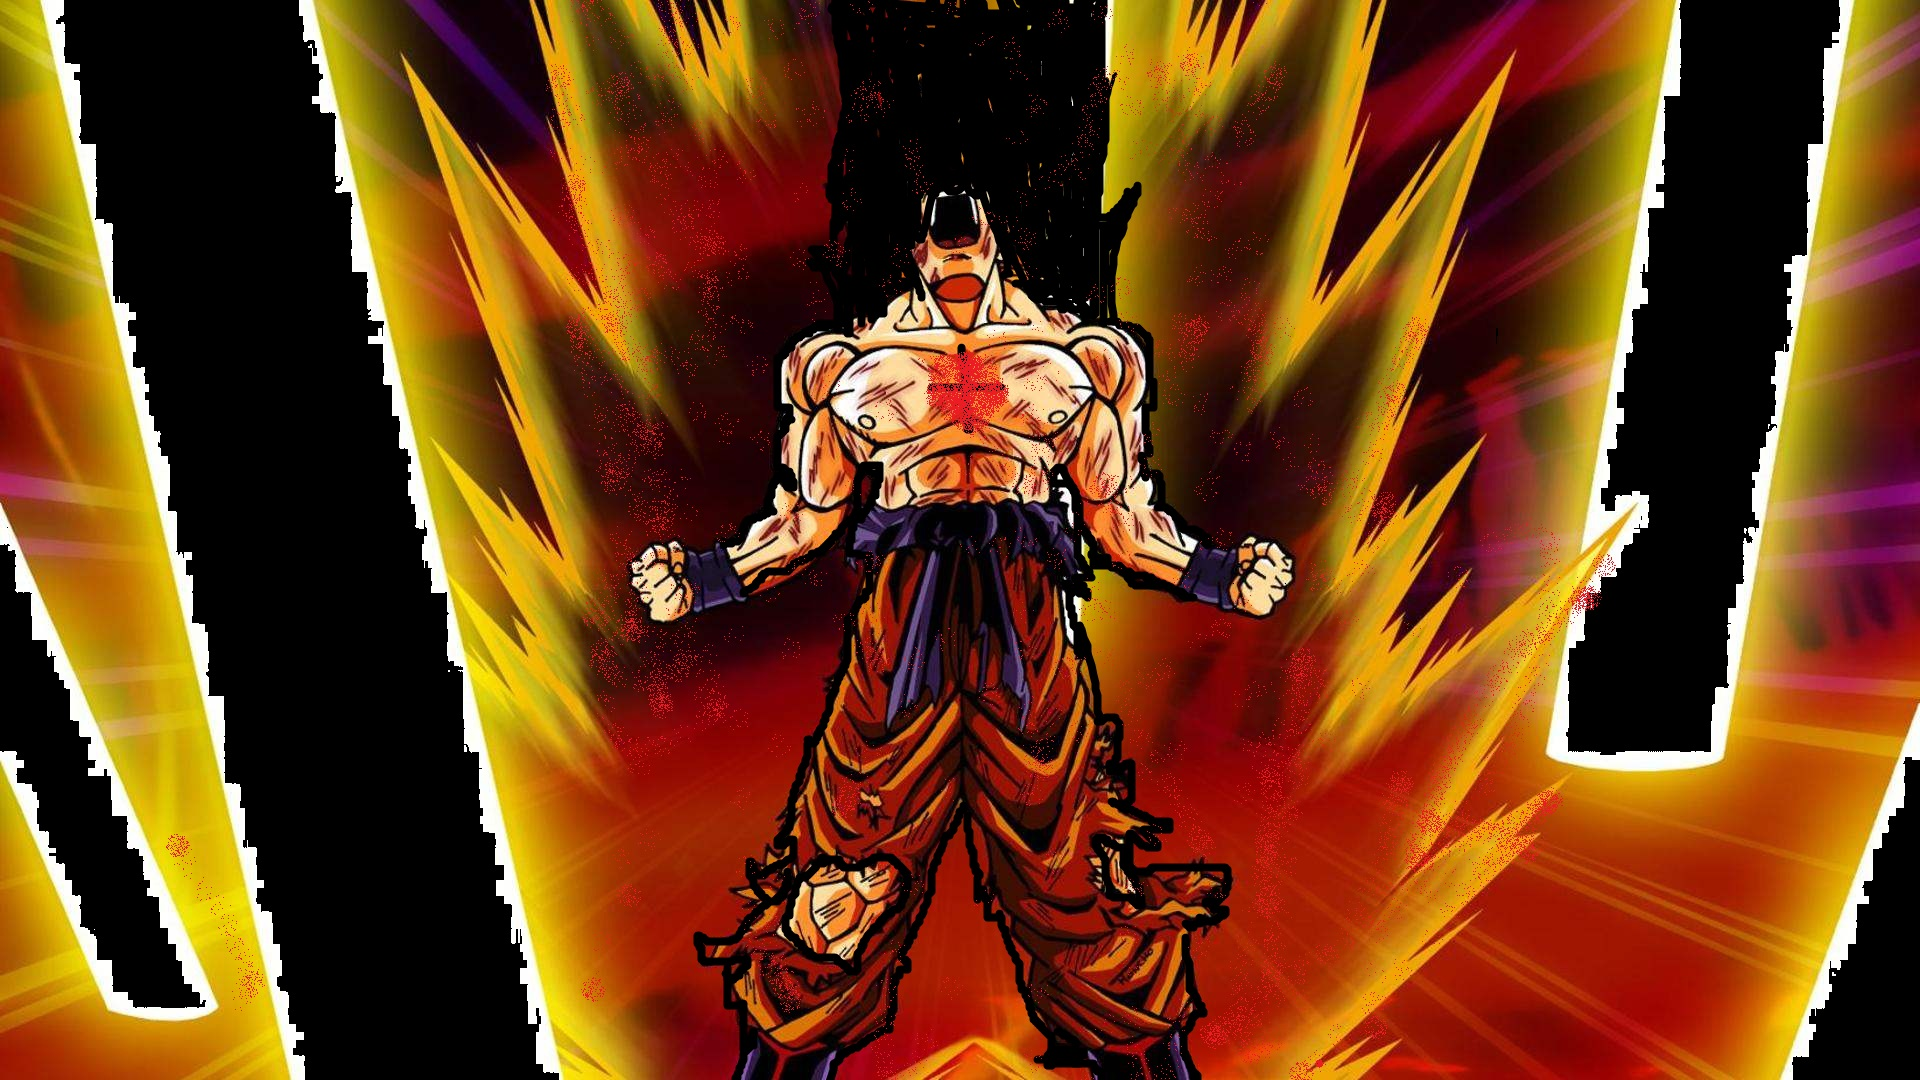 Image Son Goku Dragon Ball Super Saiyan Desktop 1920x1080 Hd